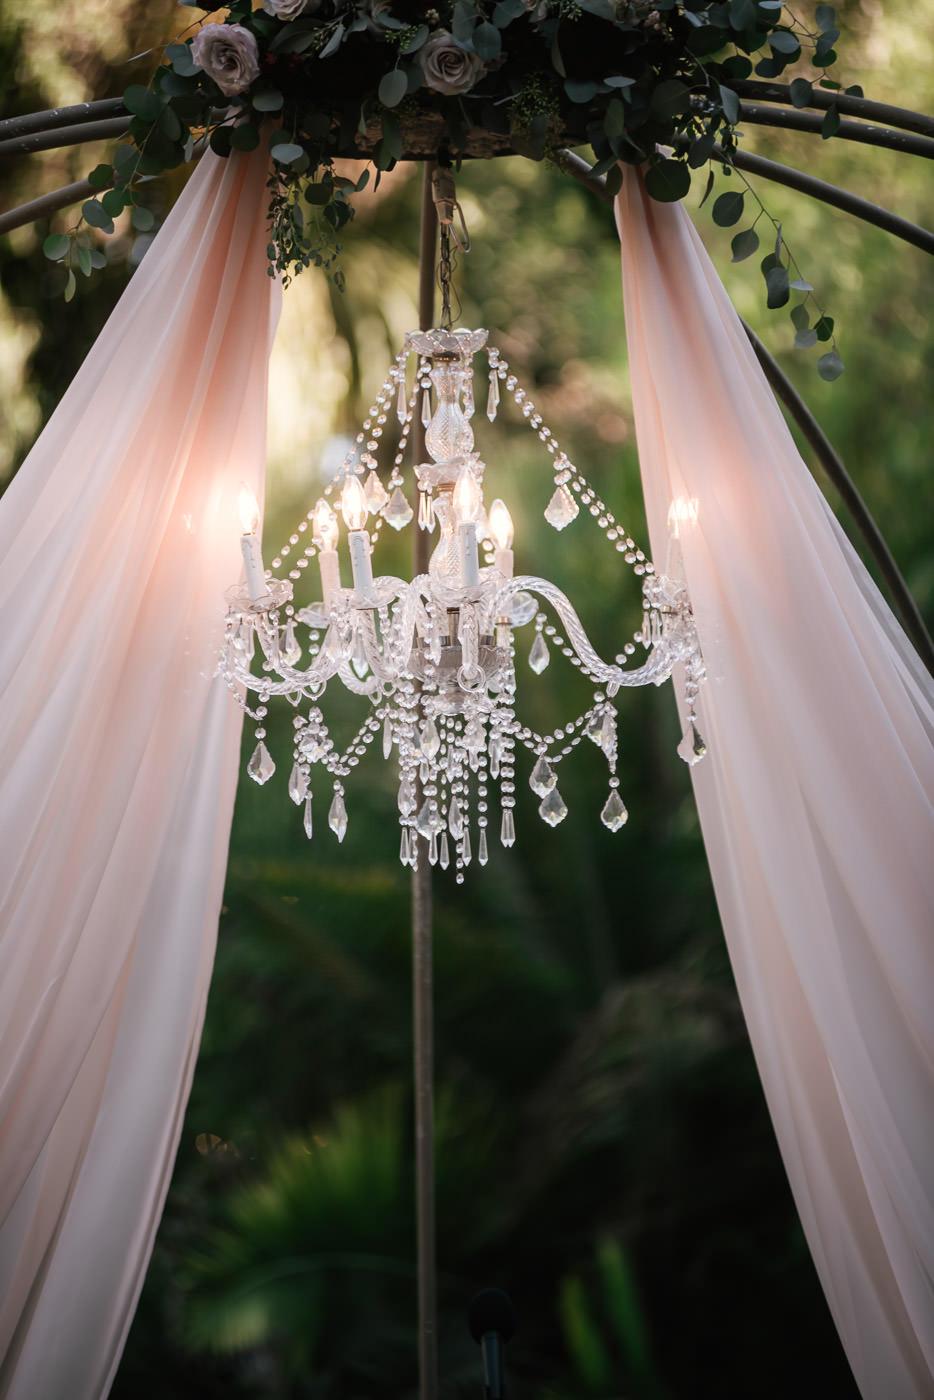 eden-gardens-wedding-photographer-romantic-33.jpg